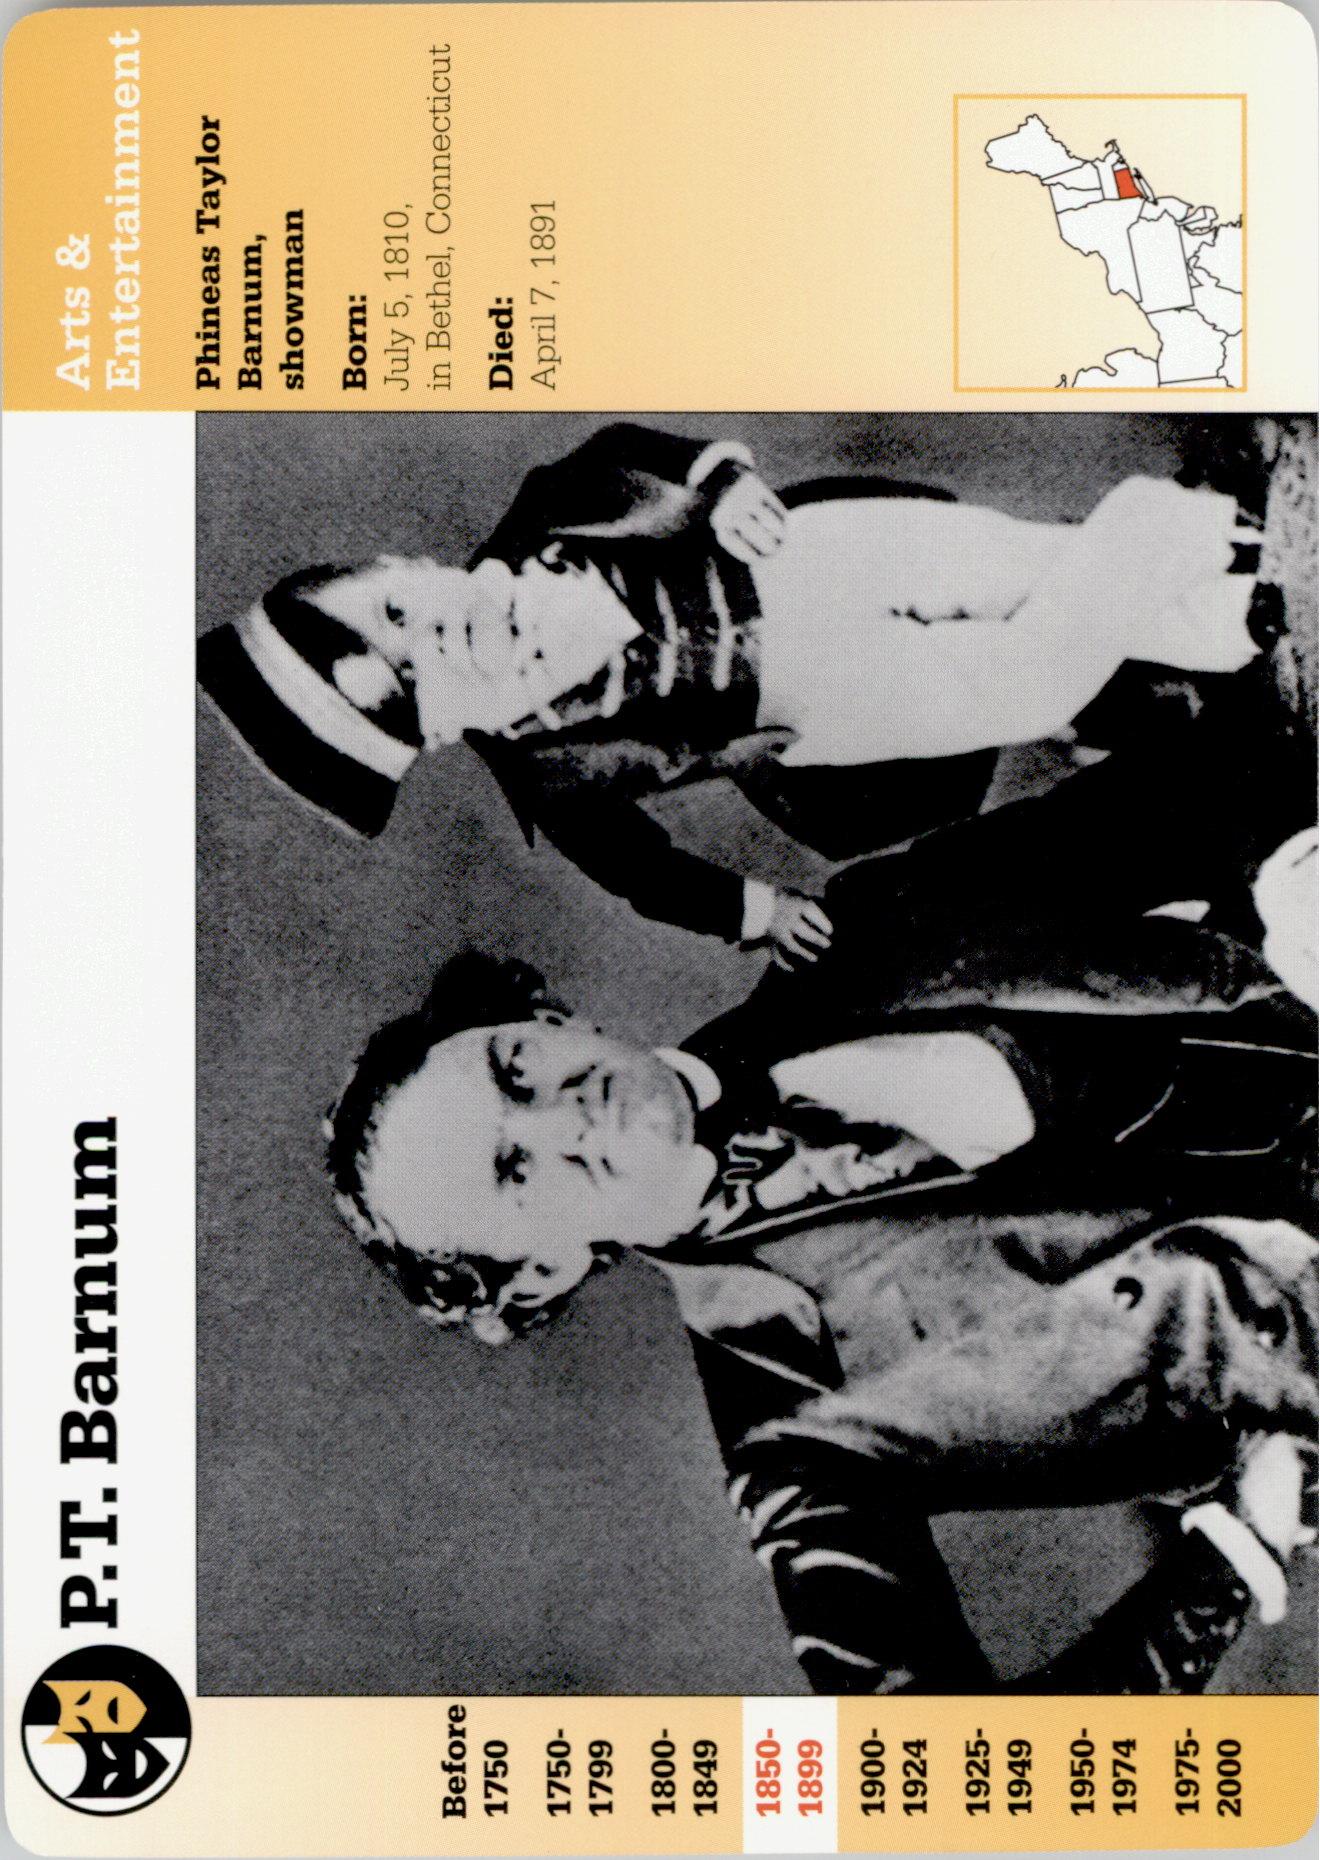 1994-01 Story of America #6-3 P.T. Barnum